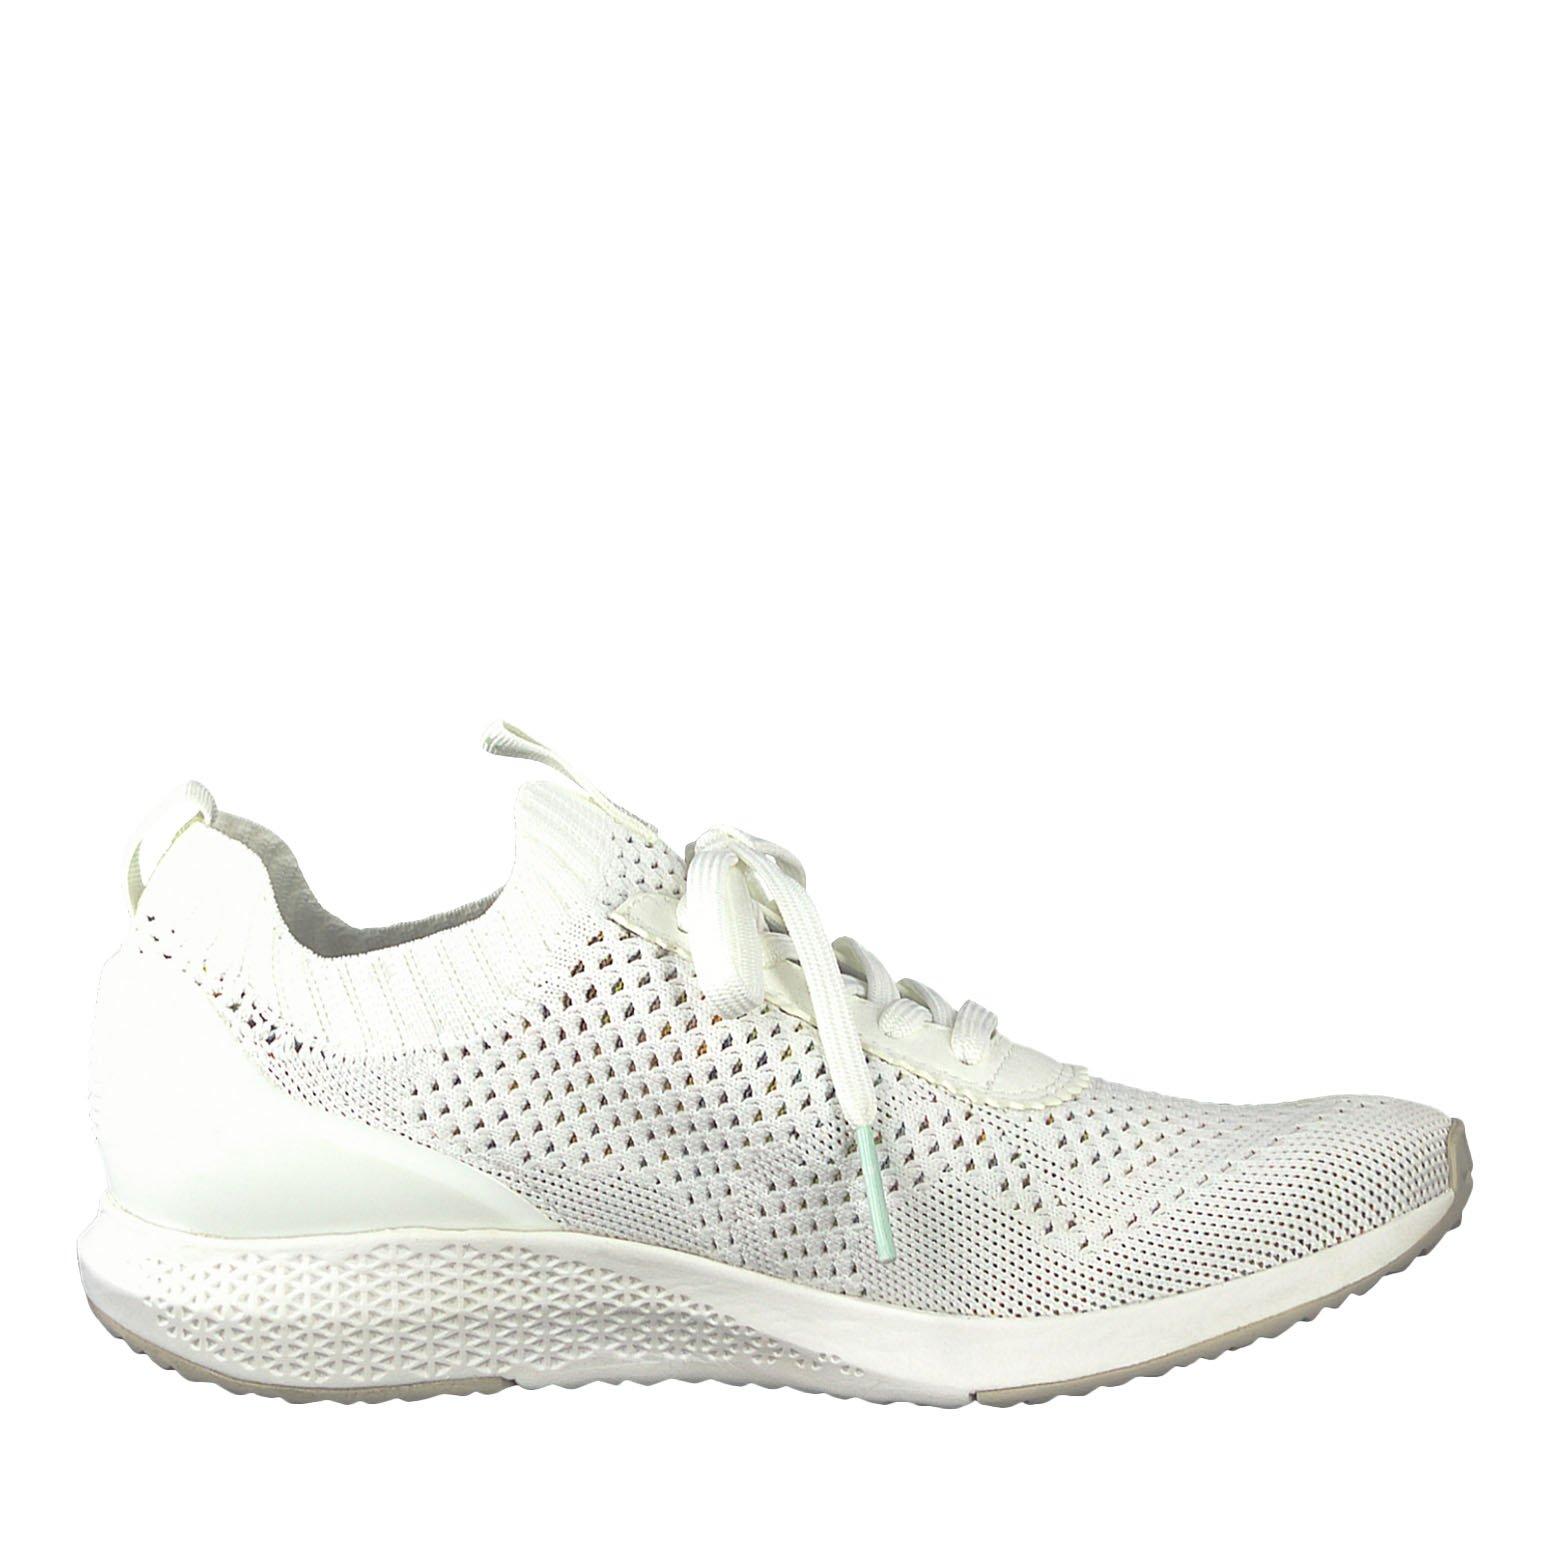 Details zu TAMARIS Damenschuh Halbschuh Schnürrschuh Sneaker Tavia GR.36 40 1 23714 22